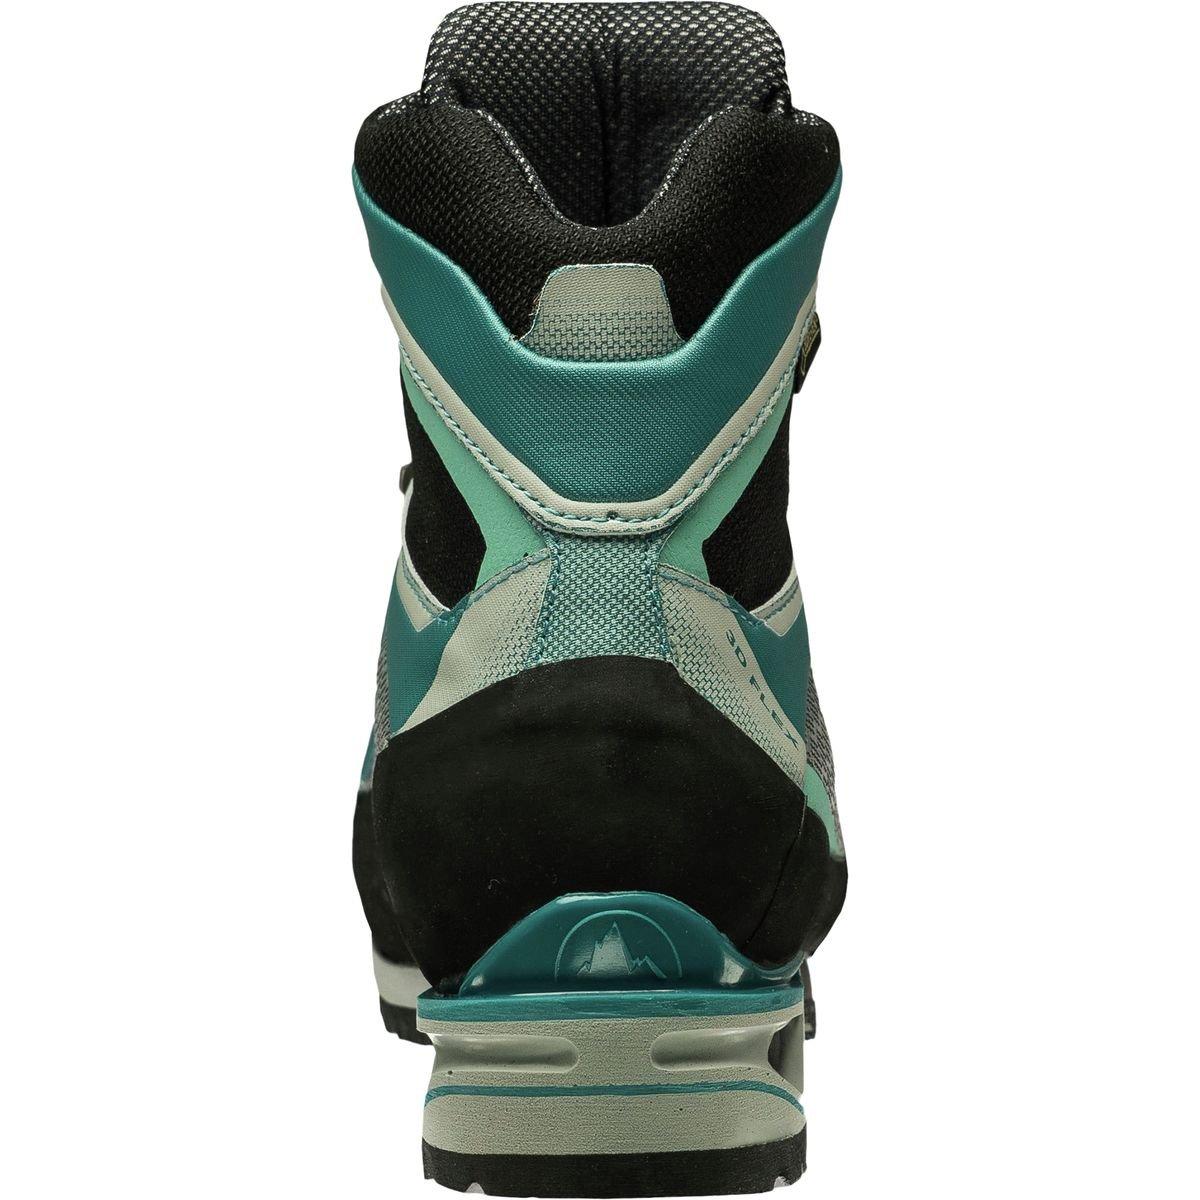 La Sportiva Trango Tower GTX Mountaineering Boot - Women's B01K7VQ2QC Medium / 40.5 M EU / 9 B(M) US|Emerald